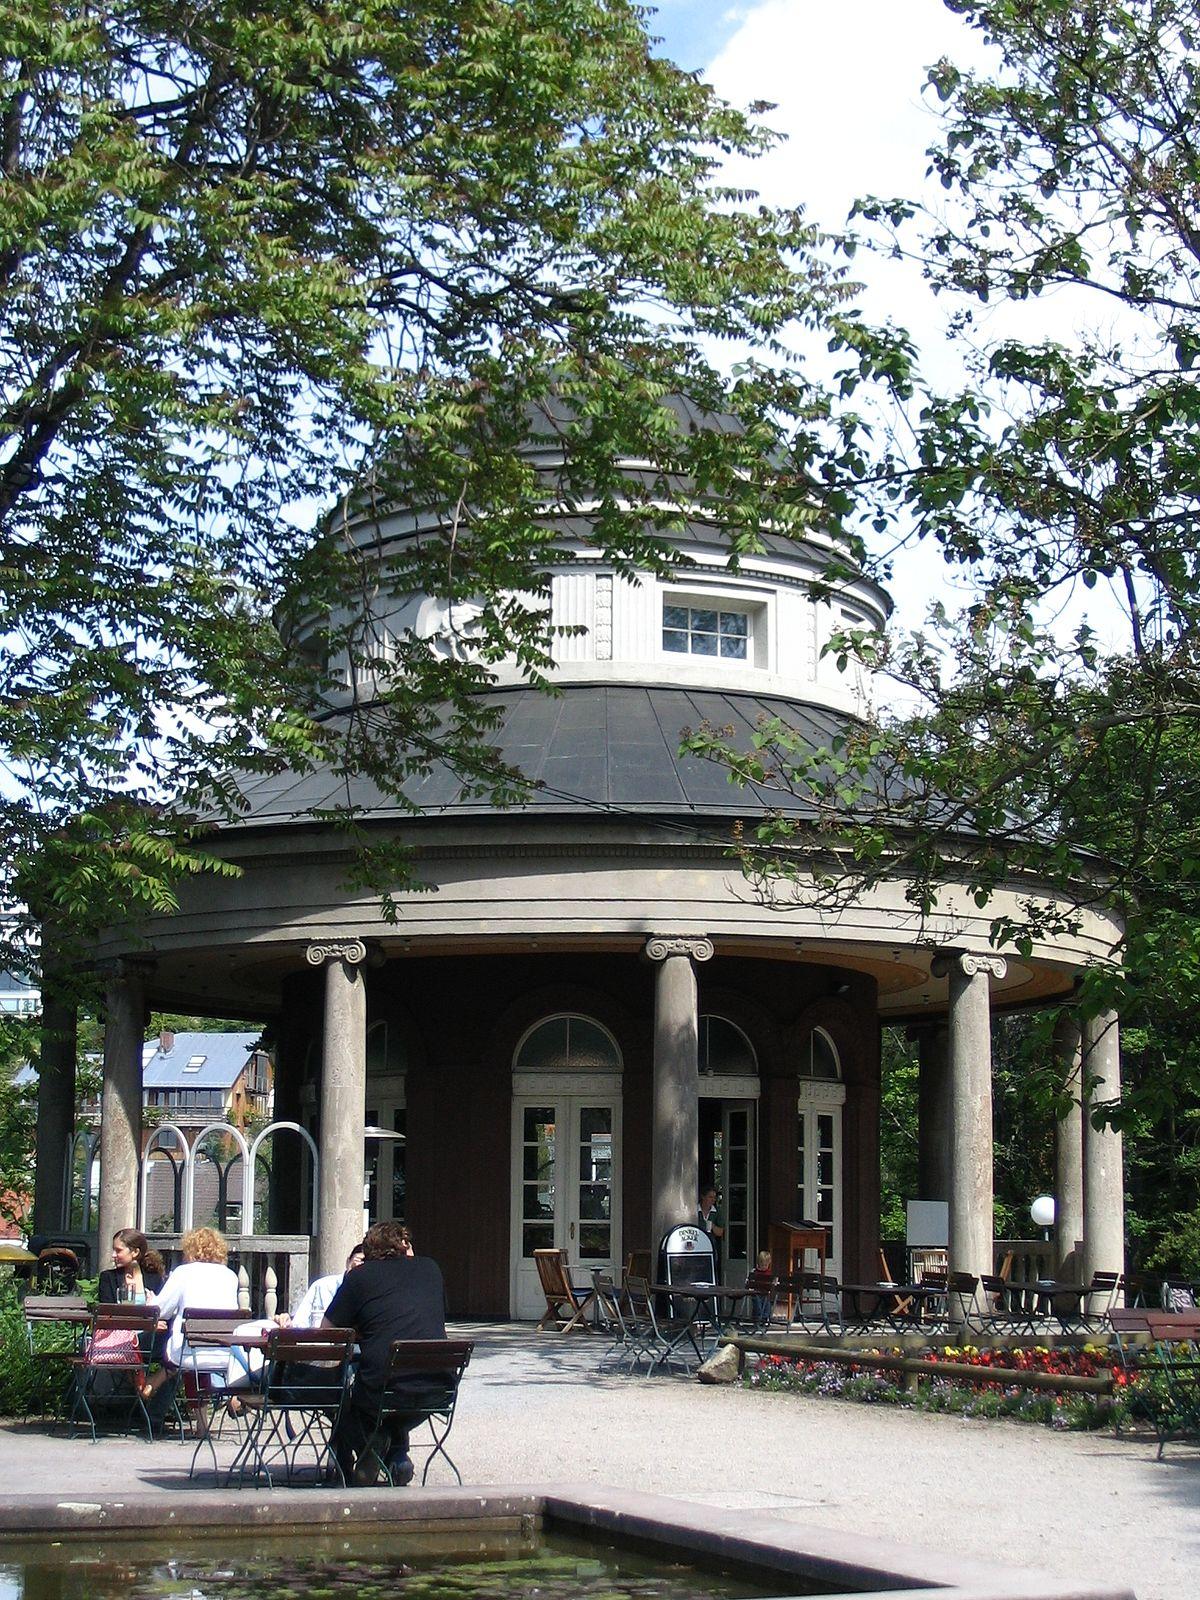 Weienburgpark  Wikipedia